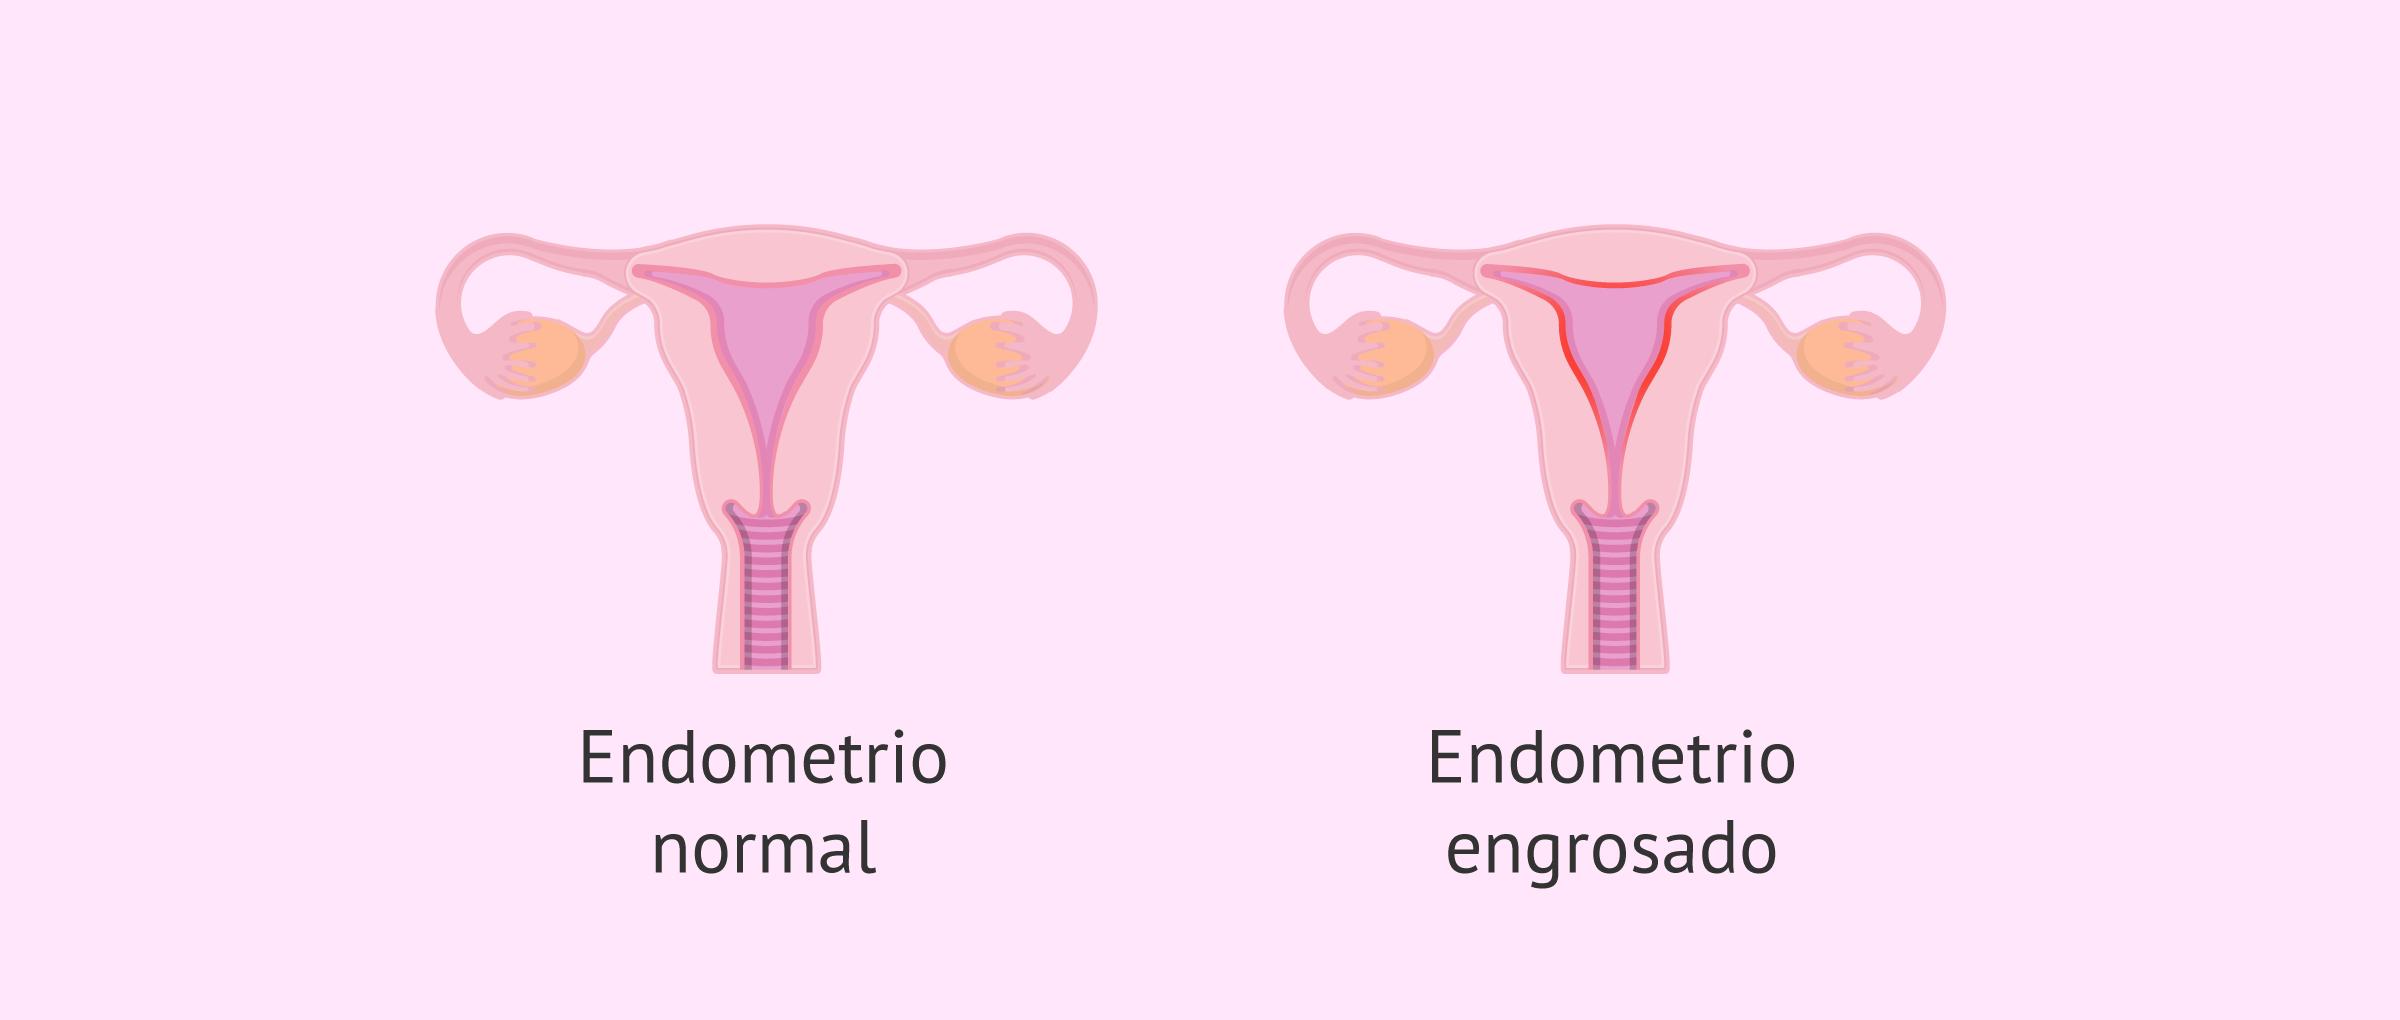 Endometrio normal y endometrio con hiperplasia